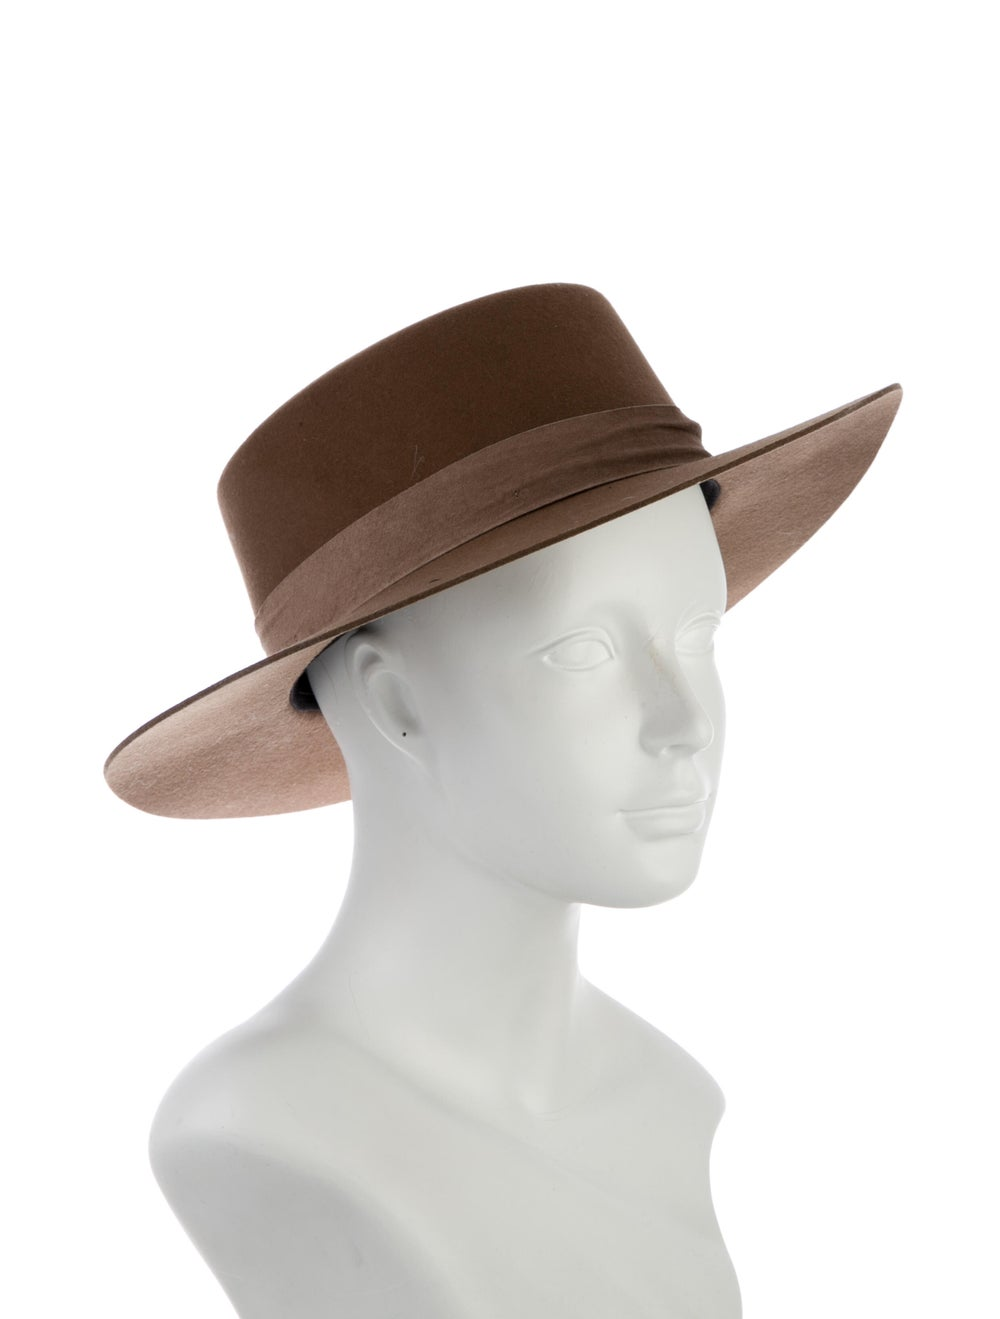 Janessa Leone Fur Felt Fedora Hat Tan - image 3